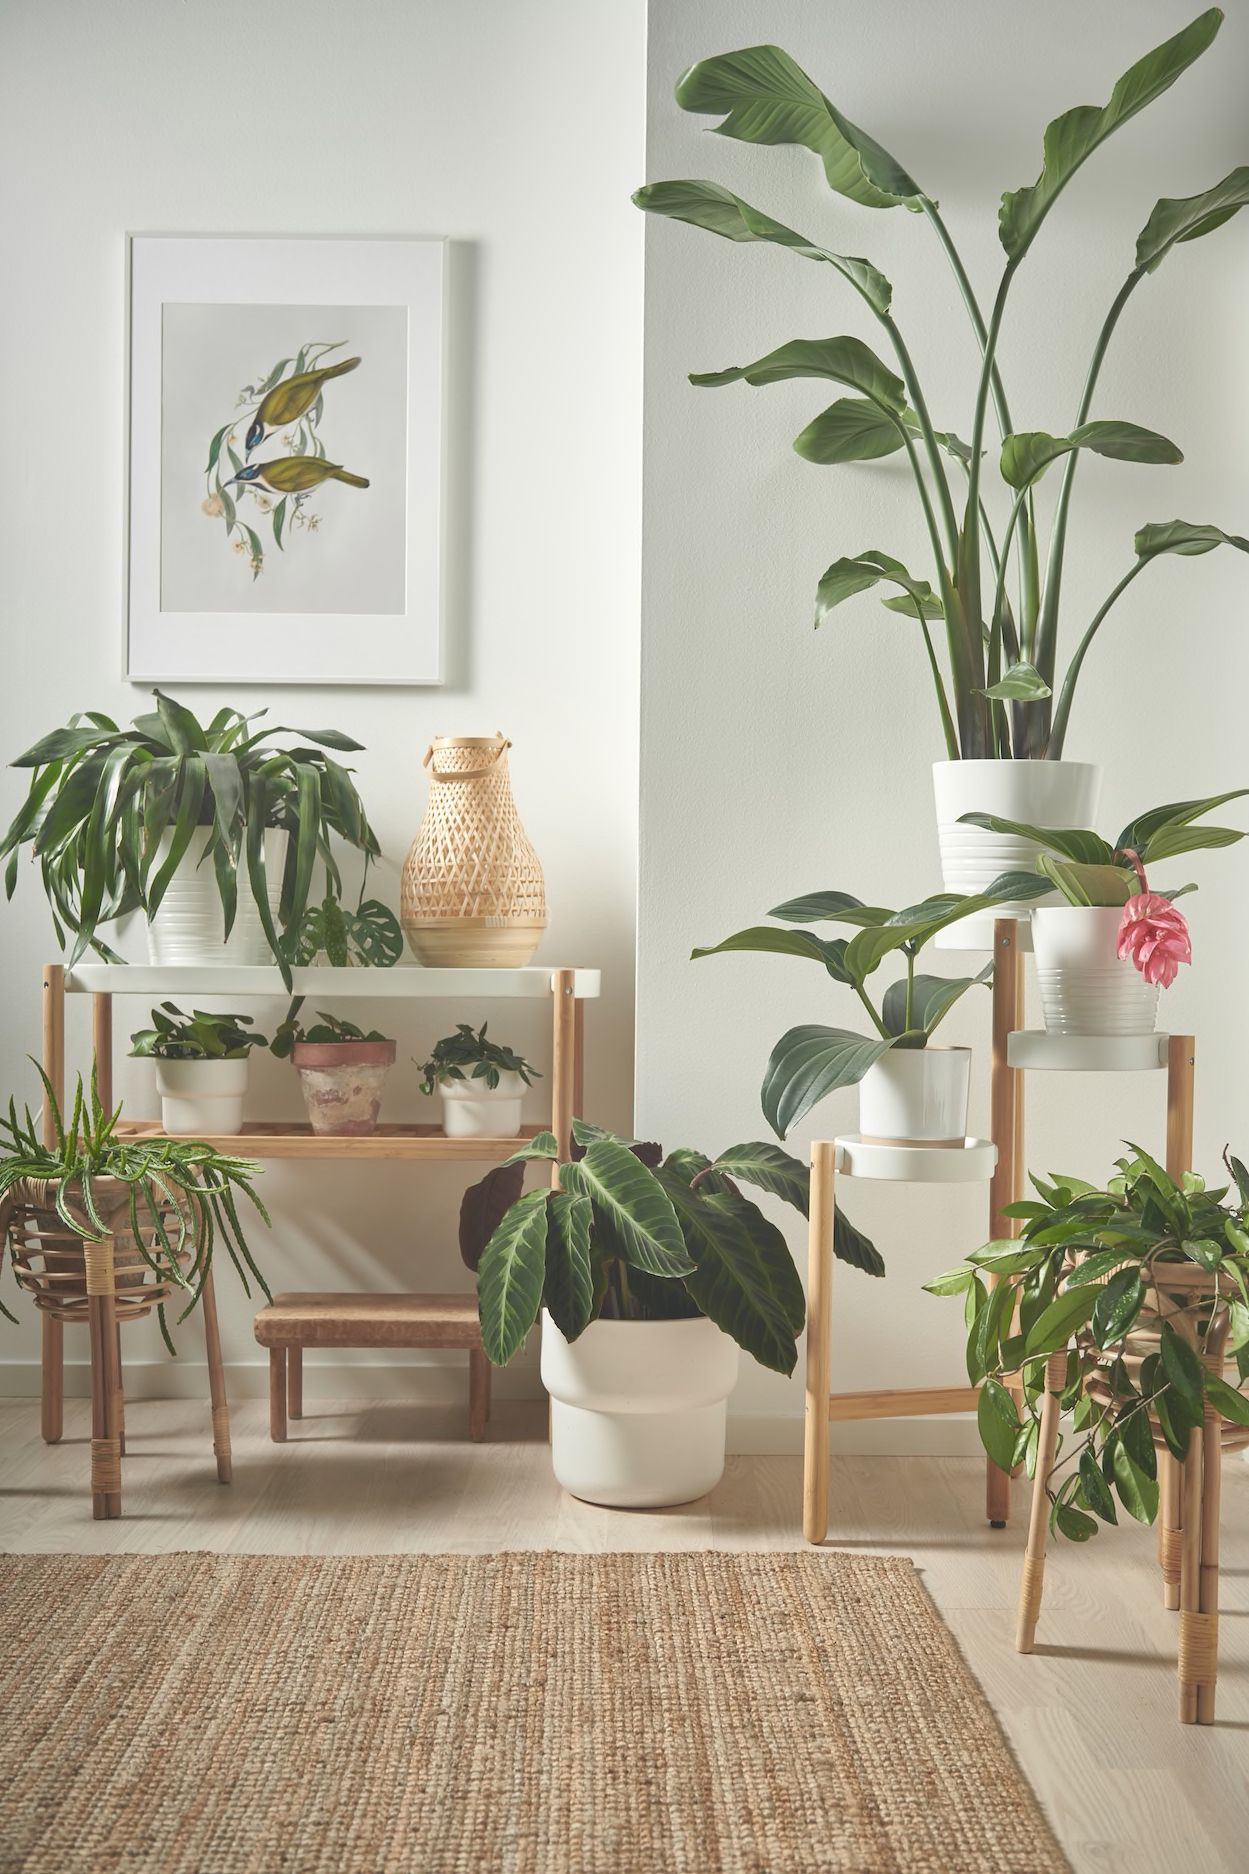 Geschickt ablenken mit Pflanzen